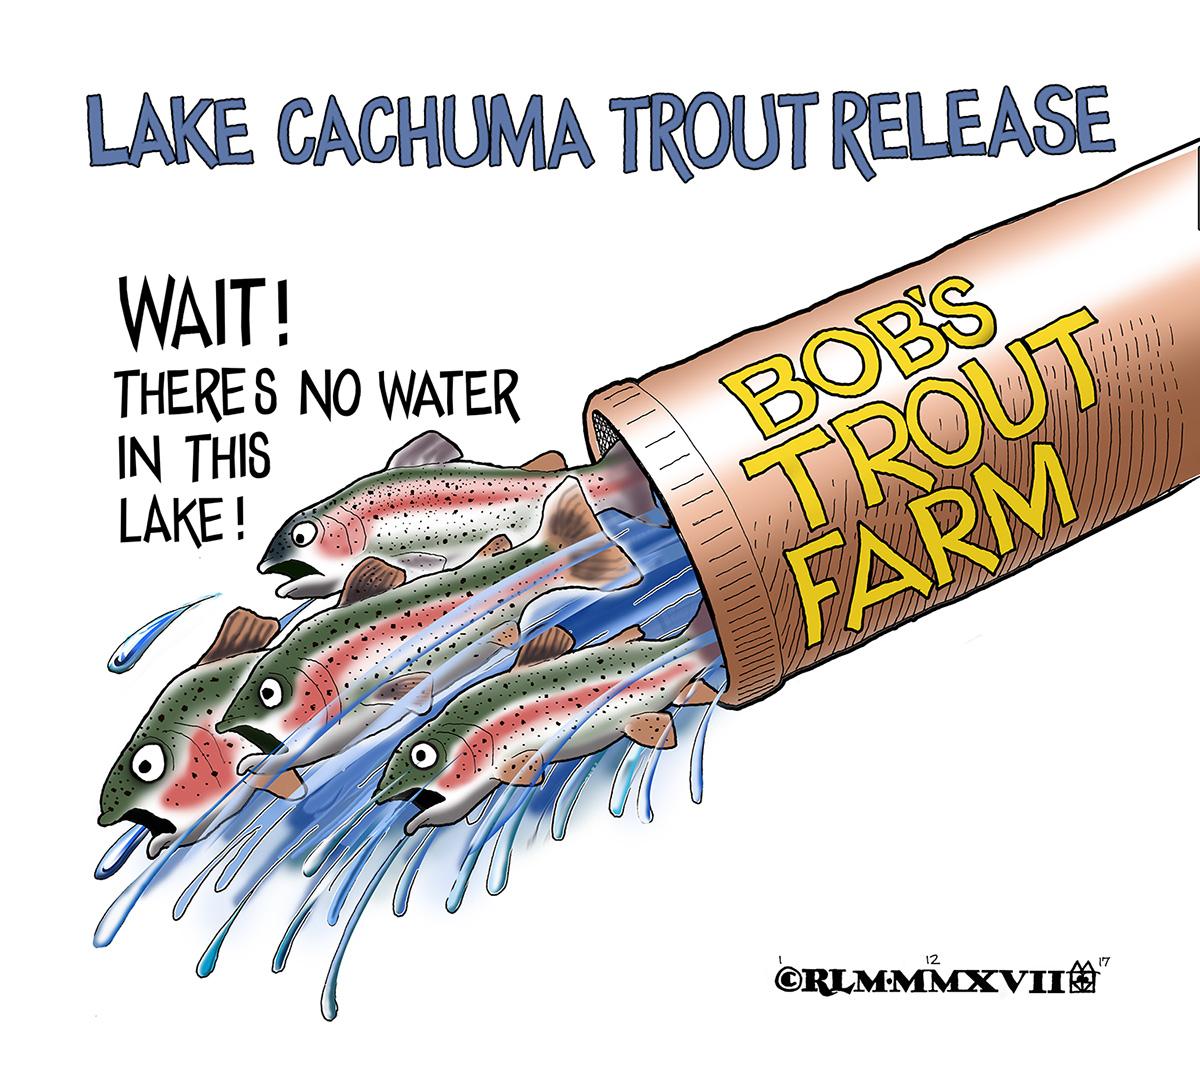 Lake Cachuma Trout